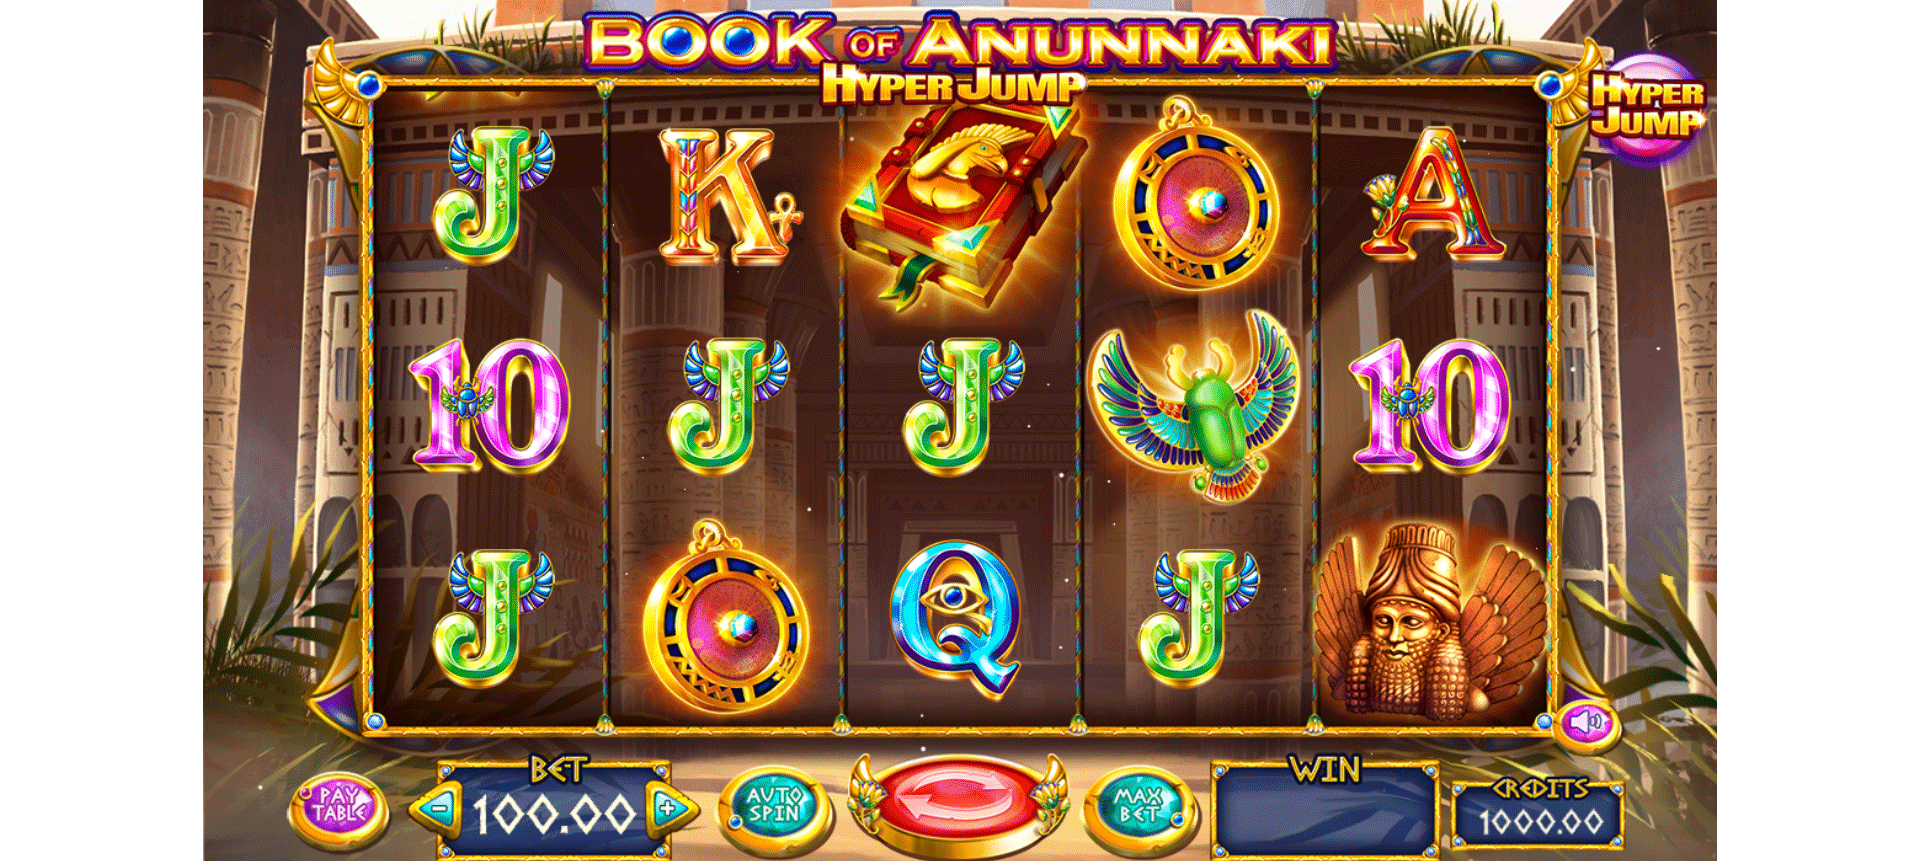 Slot Book of Anunnaki